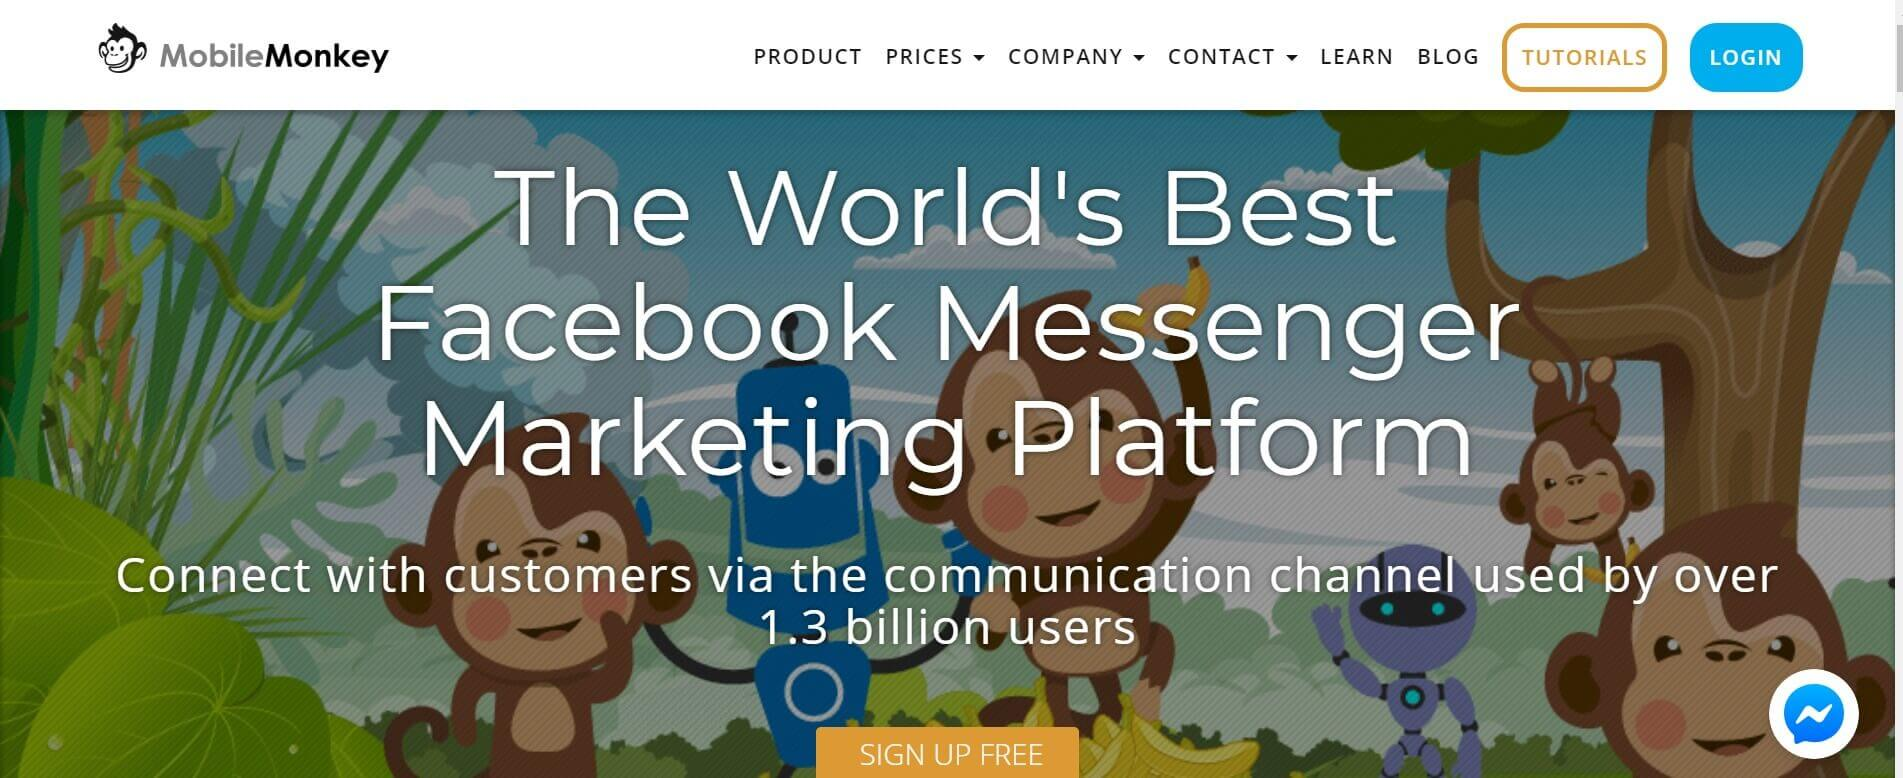 Chatbot erstellen MobileMonkey